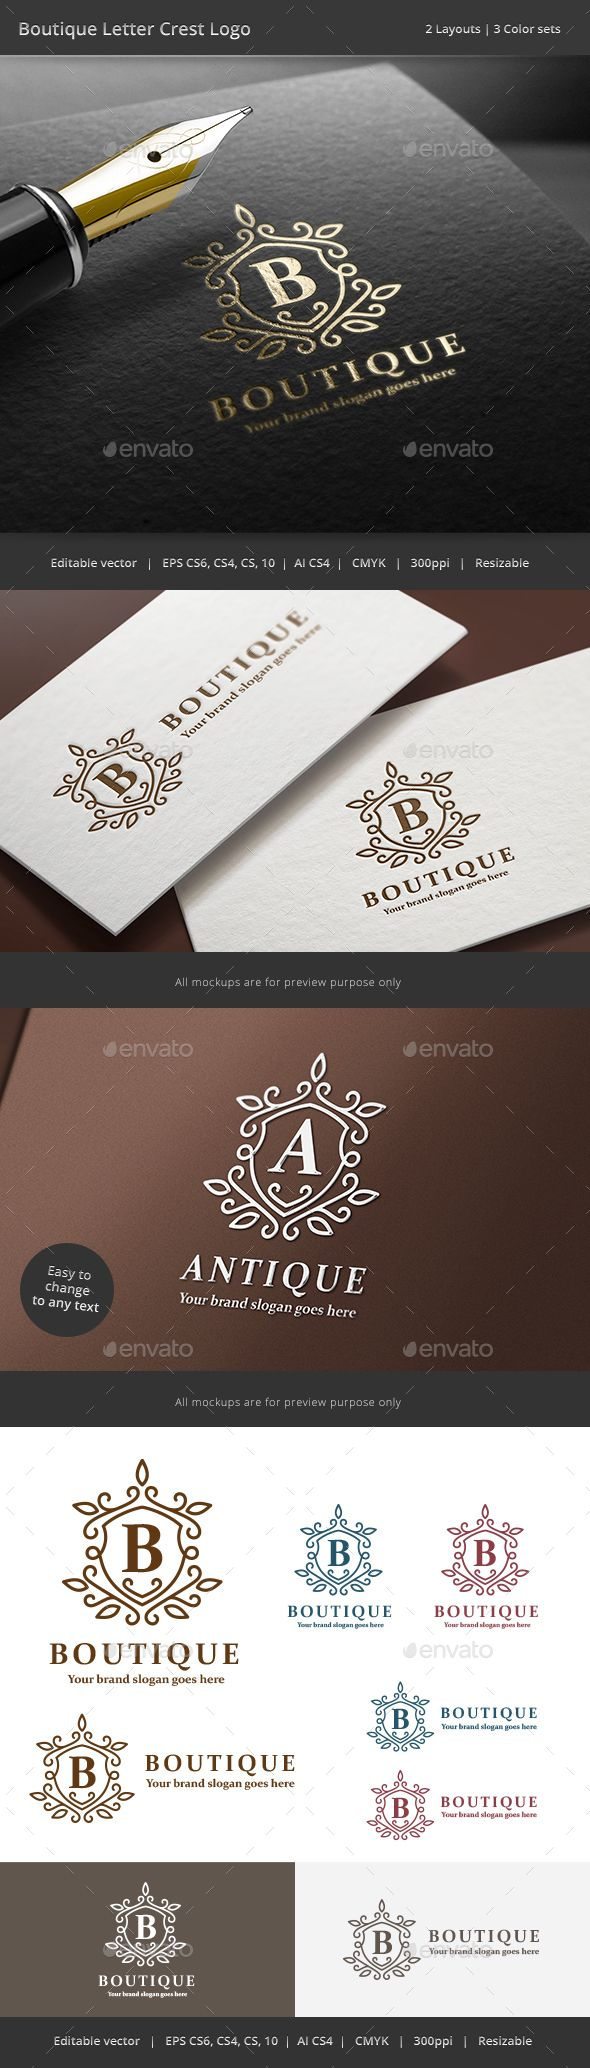 Boutique Letter Crest Logo Template Vector EPS, AI #logotype Download: http://graphicriver.net/item/boutique-letter-crest-logo/14204302?ref=ksioks